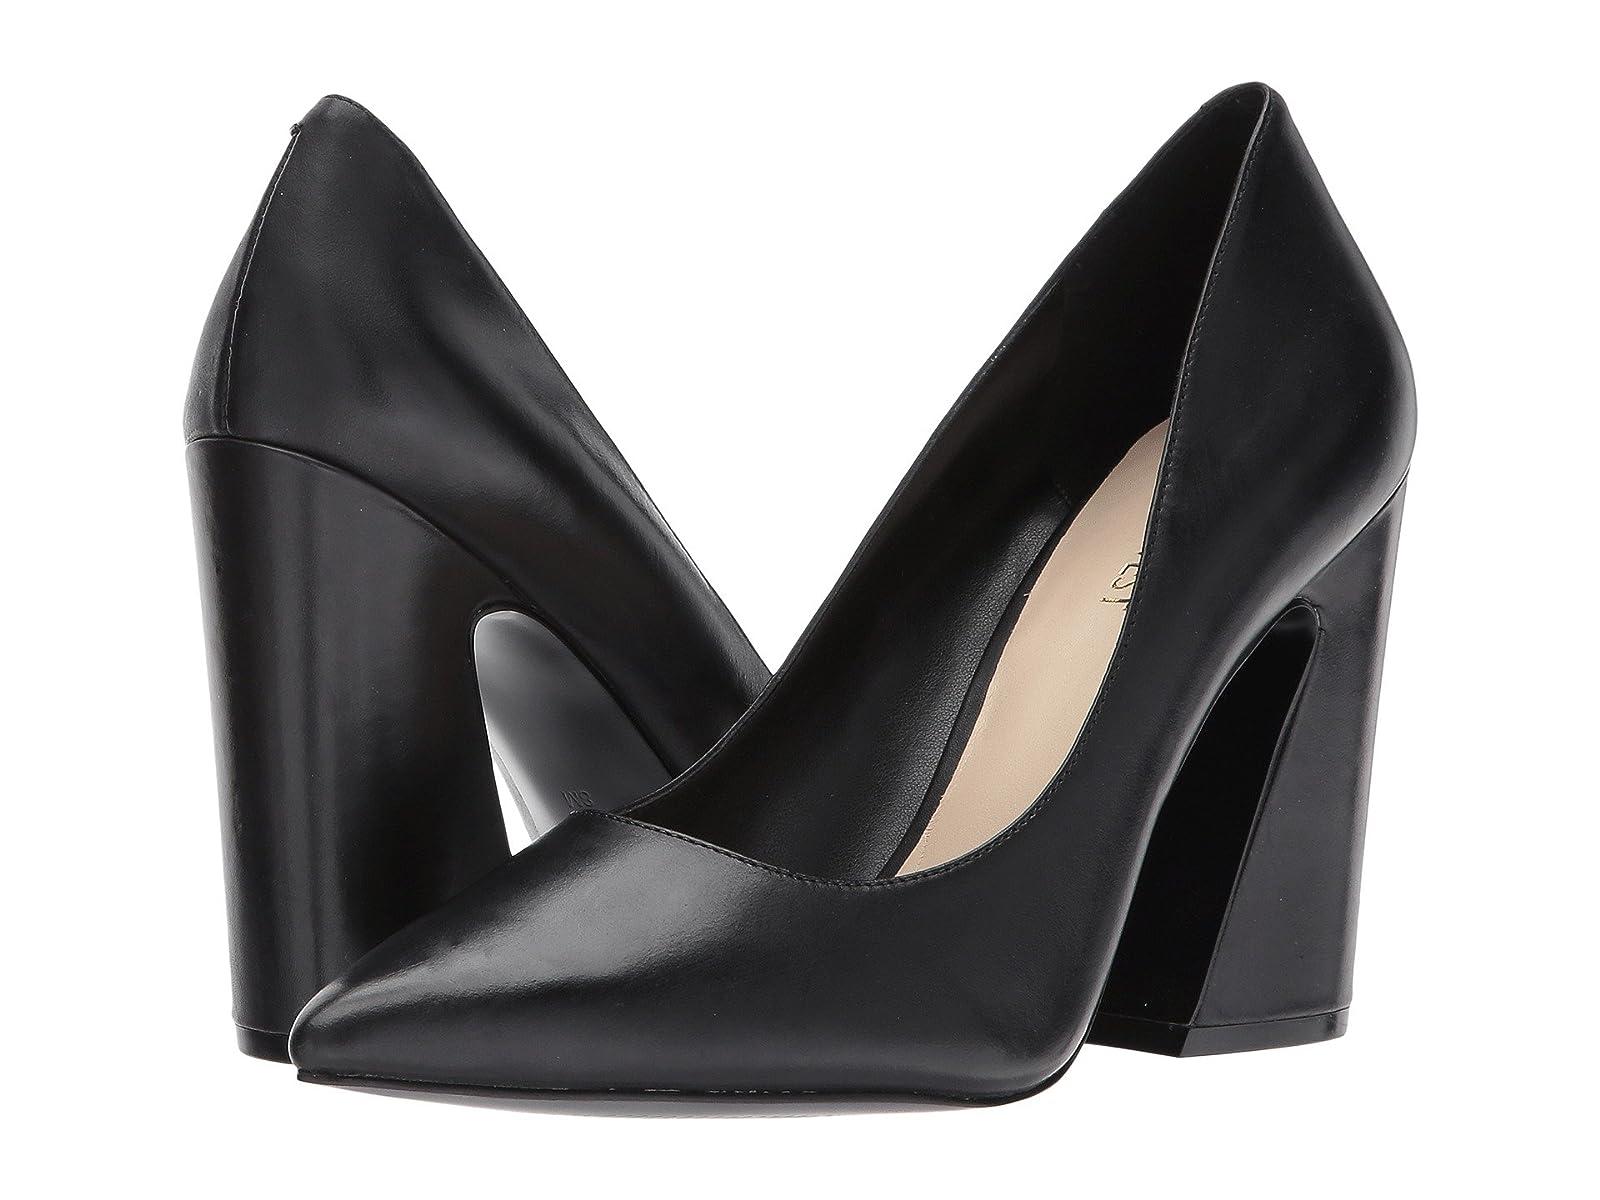 Nine West Henra Block Heel SandalCheap and distinctive eye-catching shoes